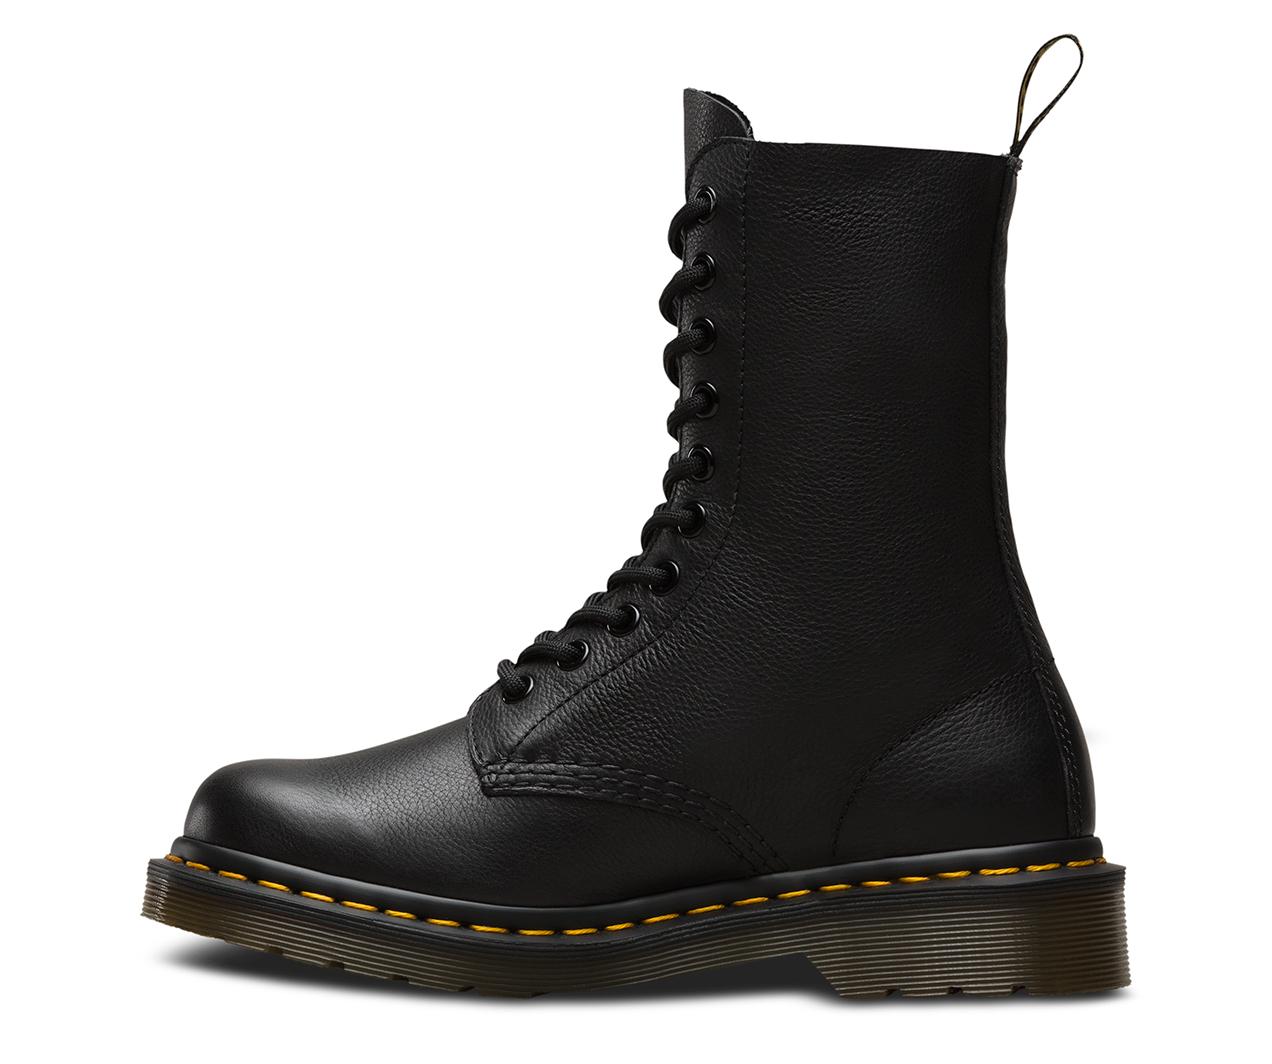 815000bd05d 1490 VIRGINIA | Women's Boots & Shoes | Canada